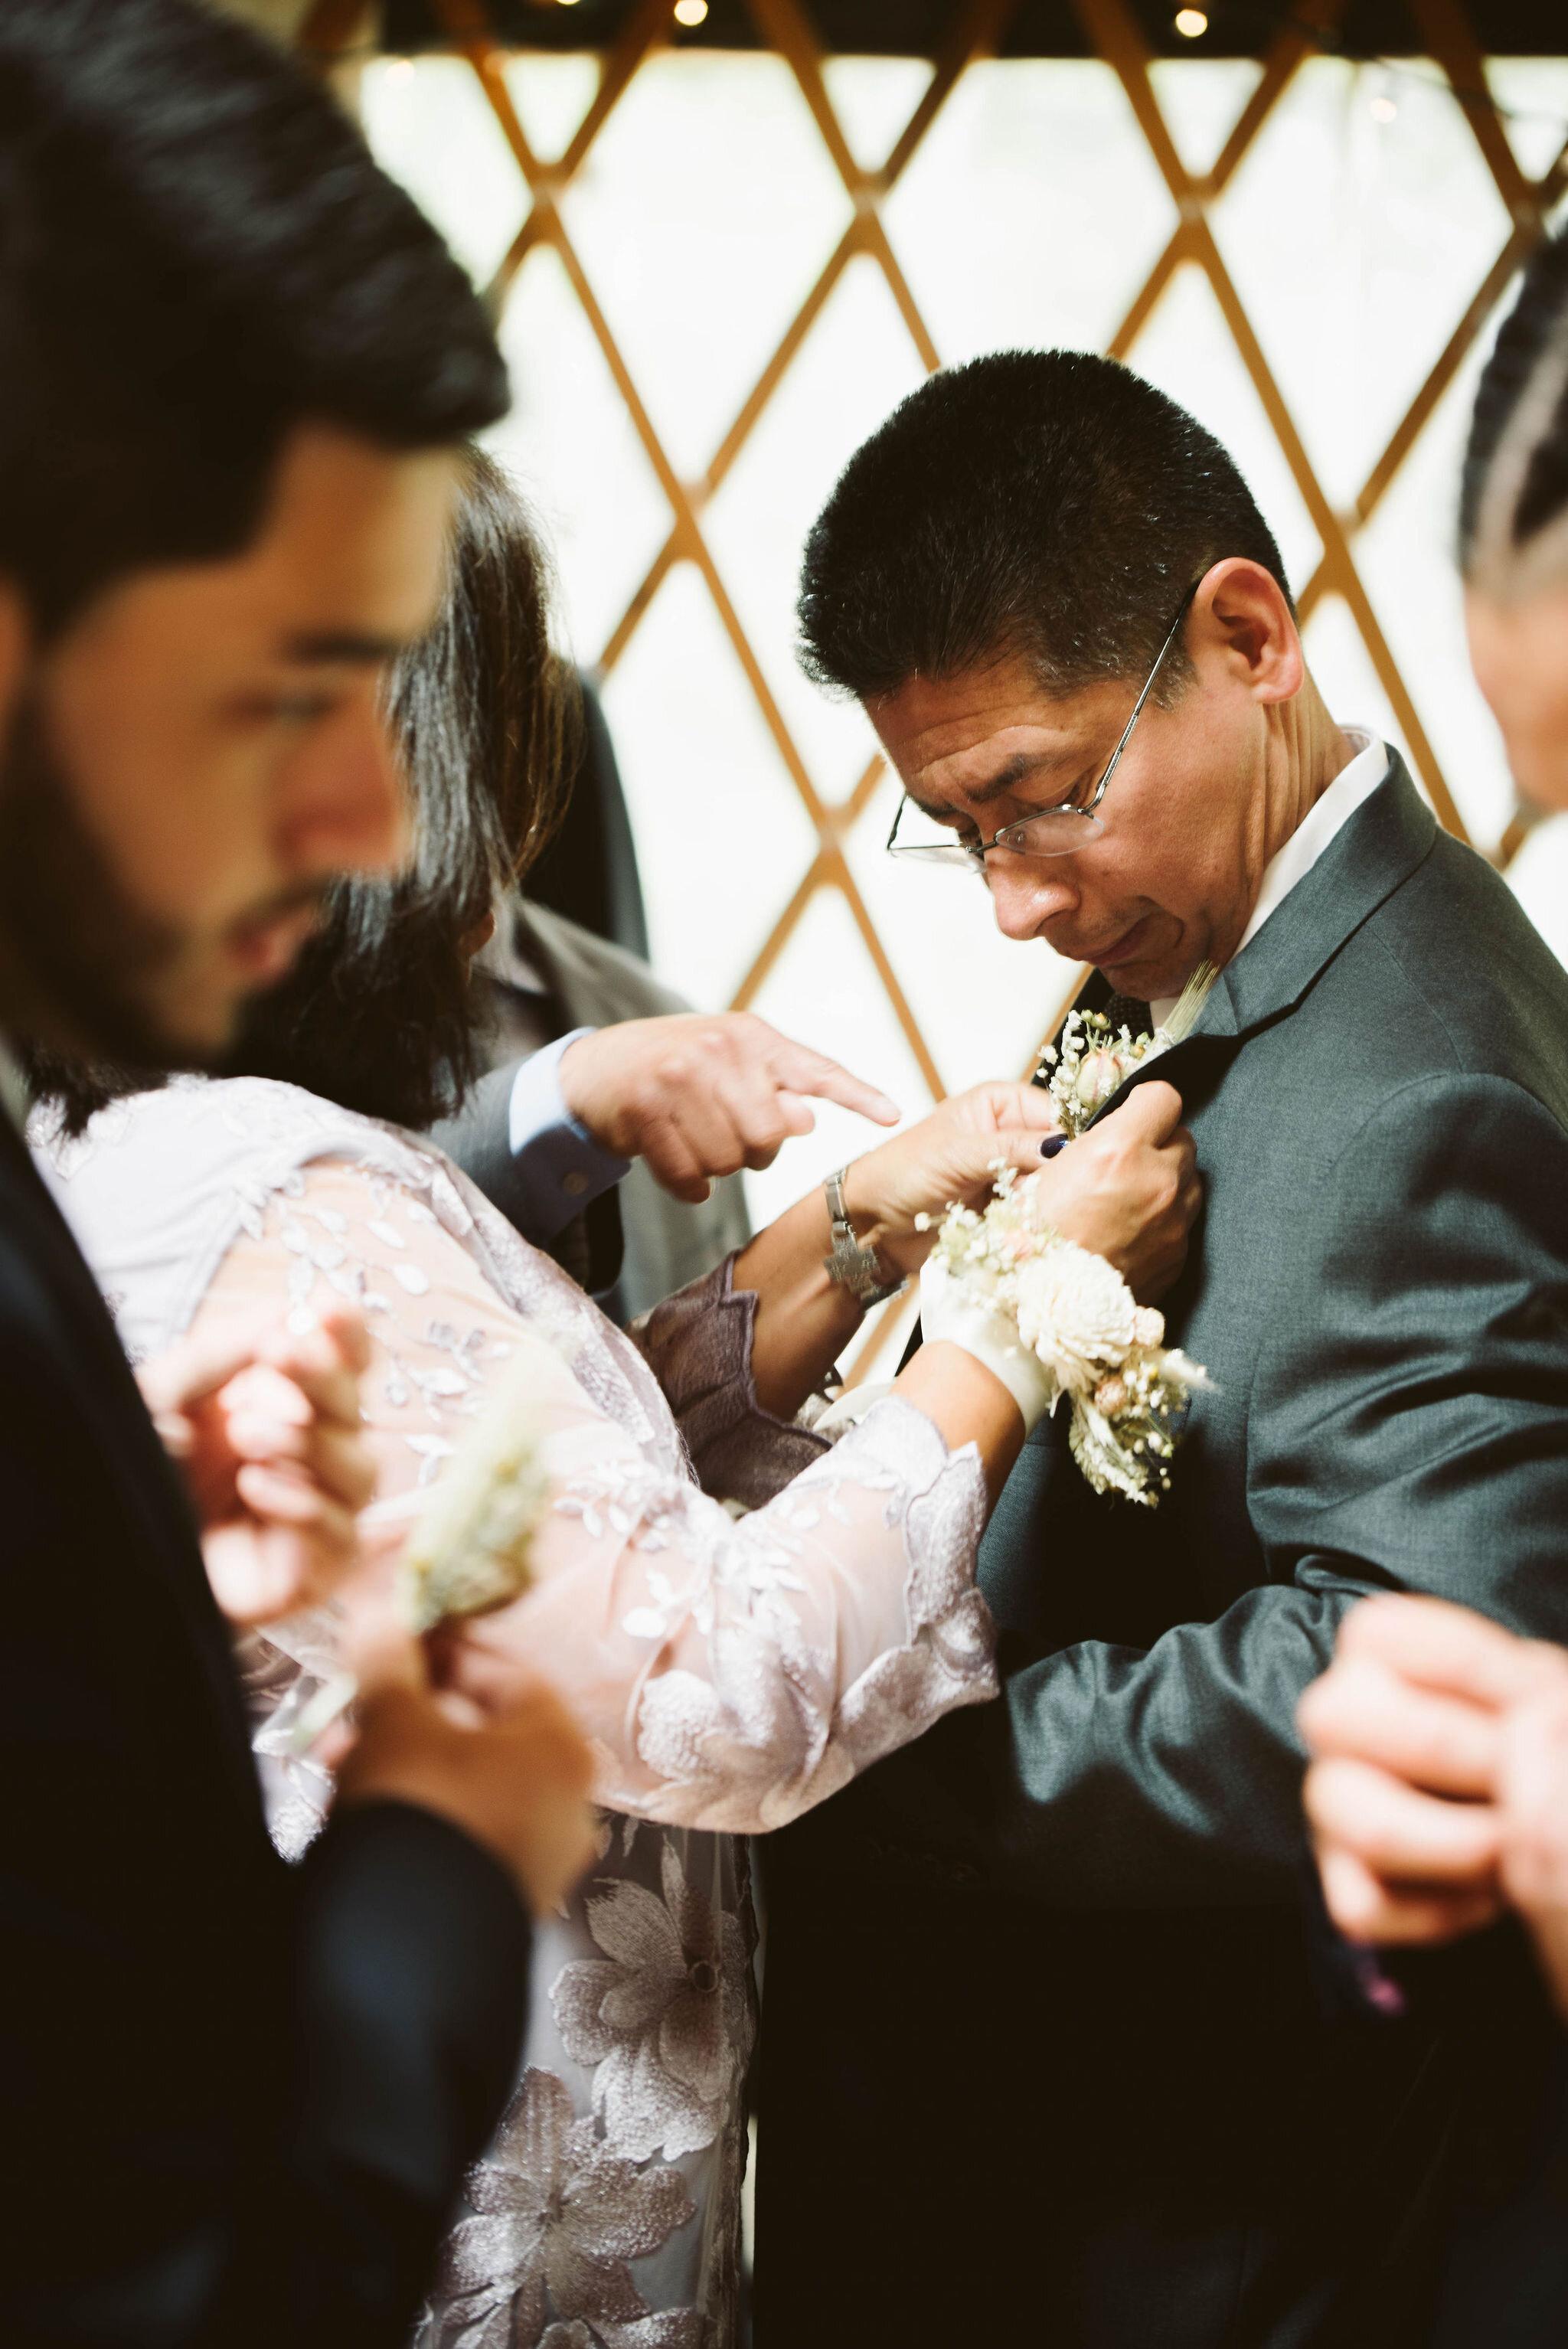 Venture-Retreat-Center-Wedding-Pescadero-Sat-Aaron-Pritam-The-Shalom-Imaginative-90.jpg